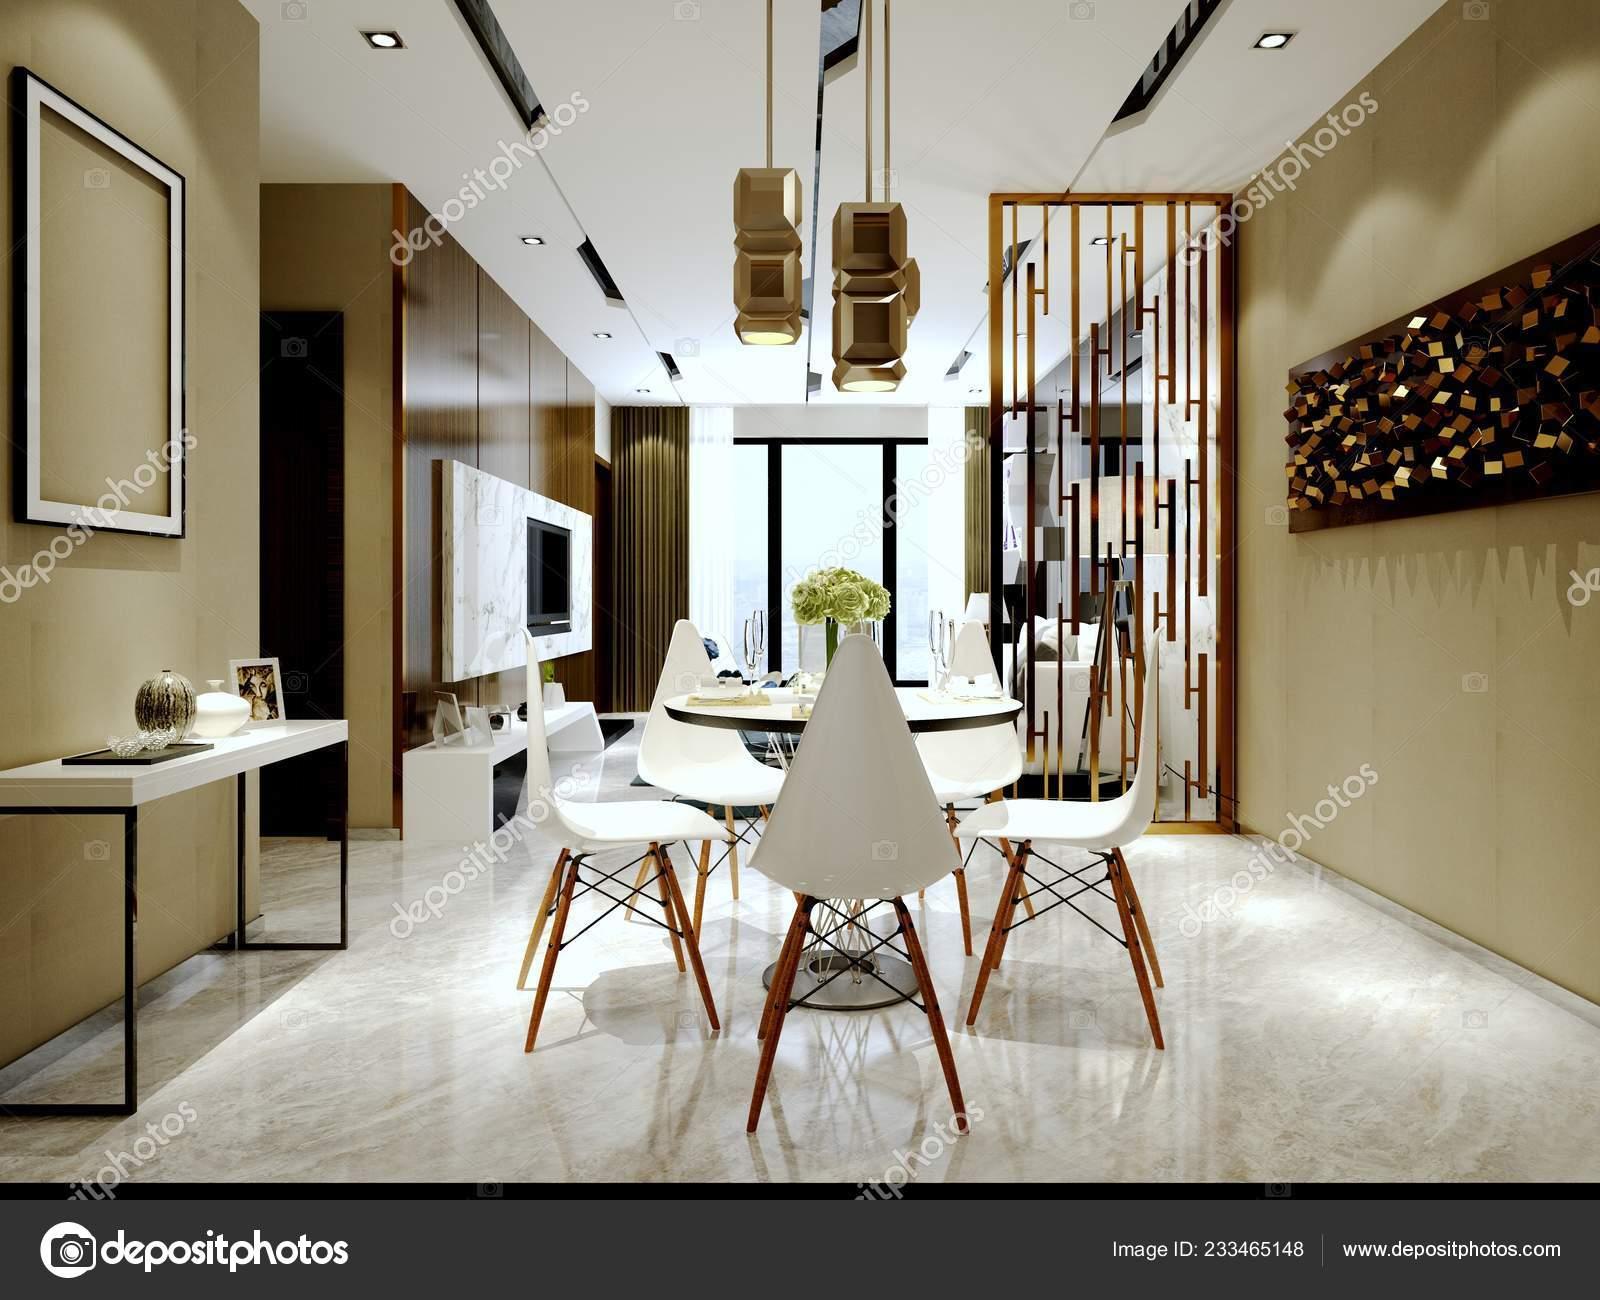 Render House Interior Living Room Stock Photo C Mtellioglu 233465148